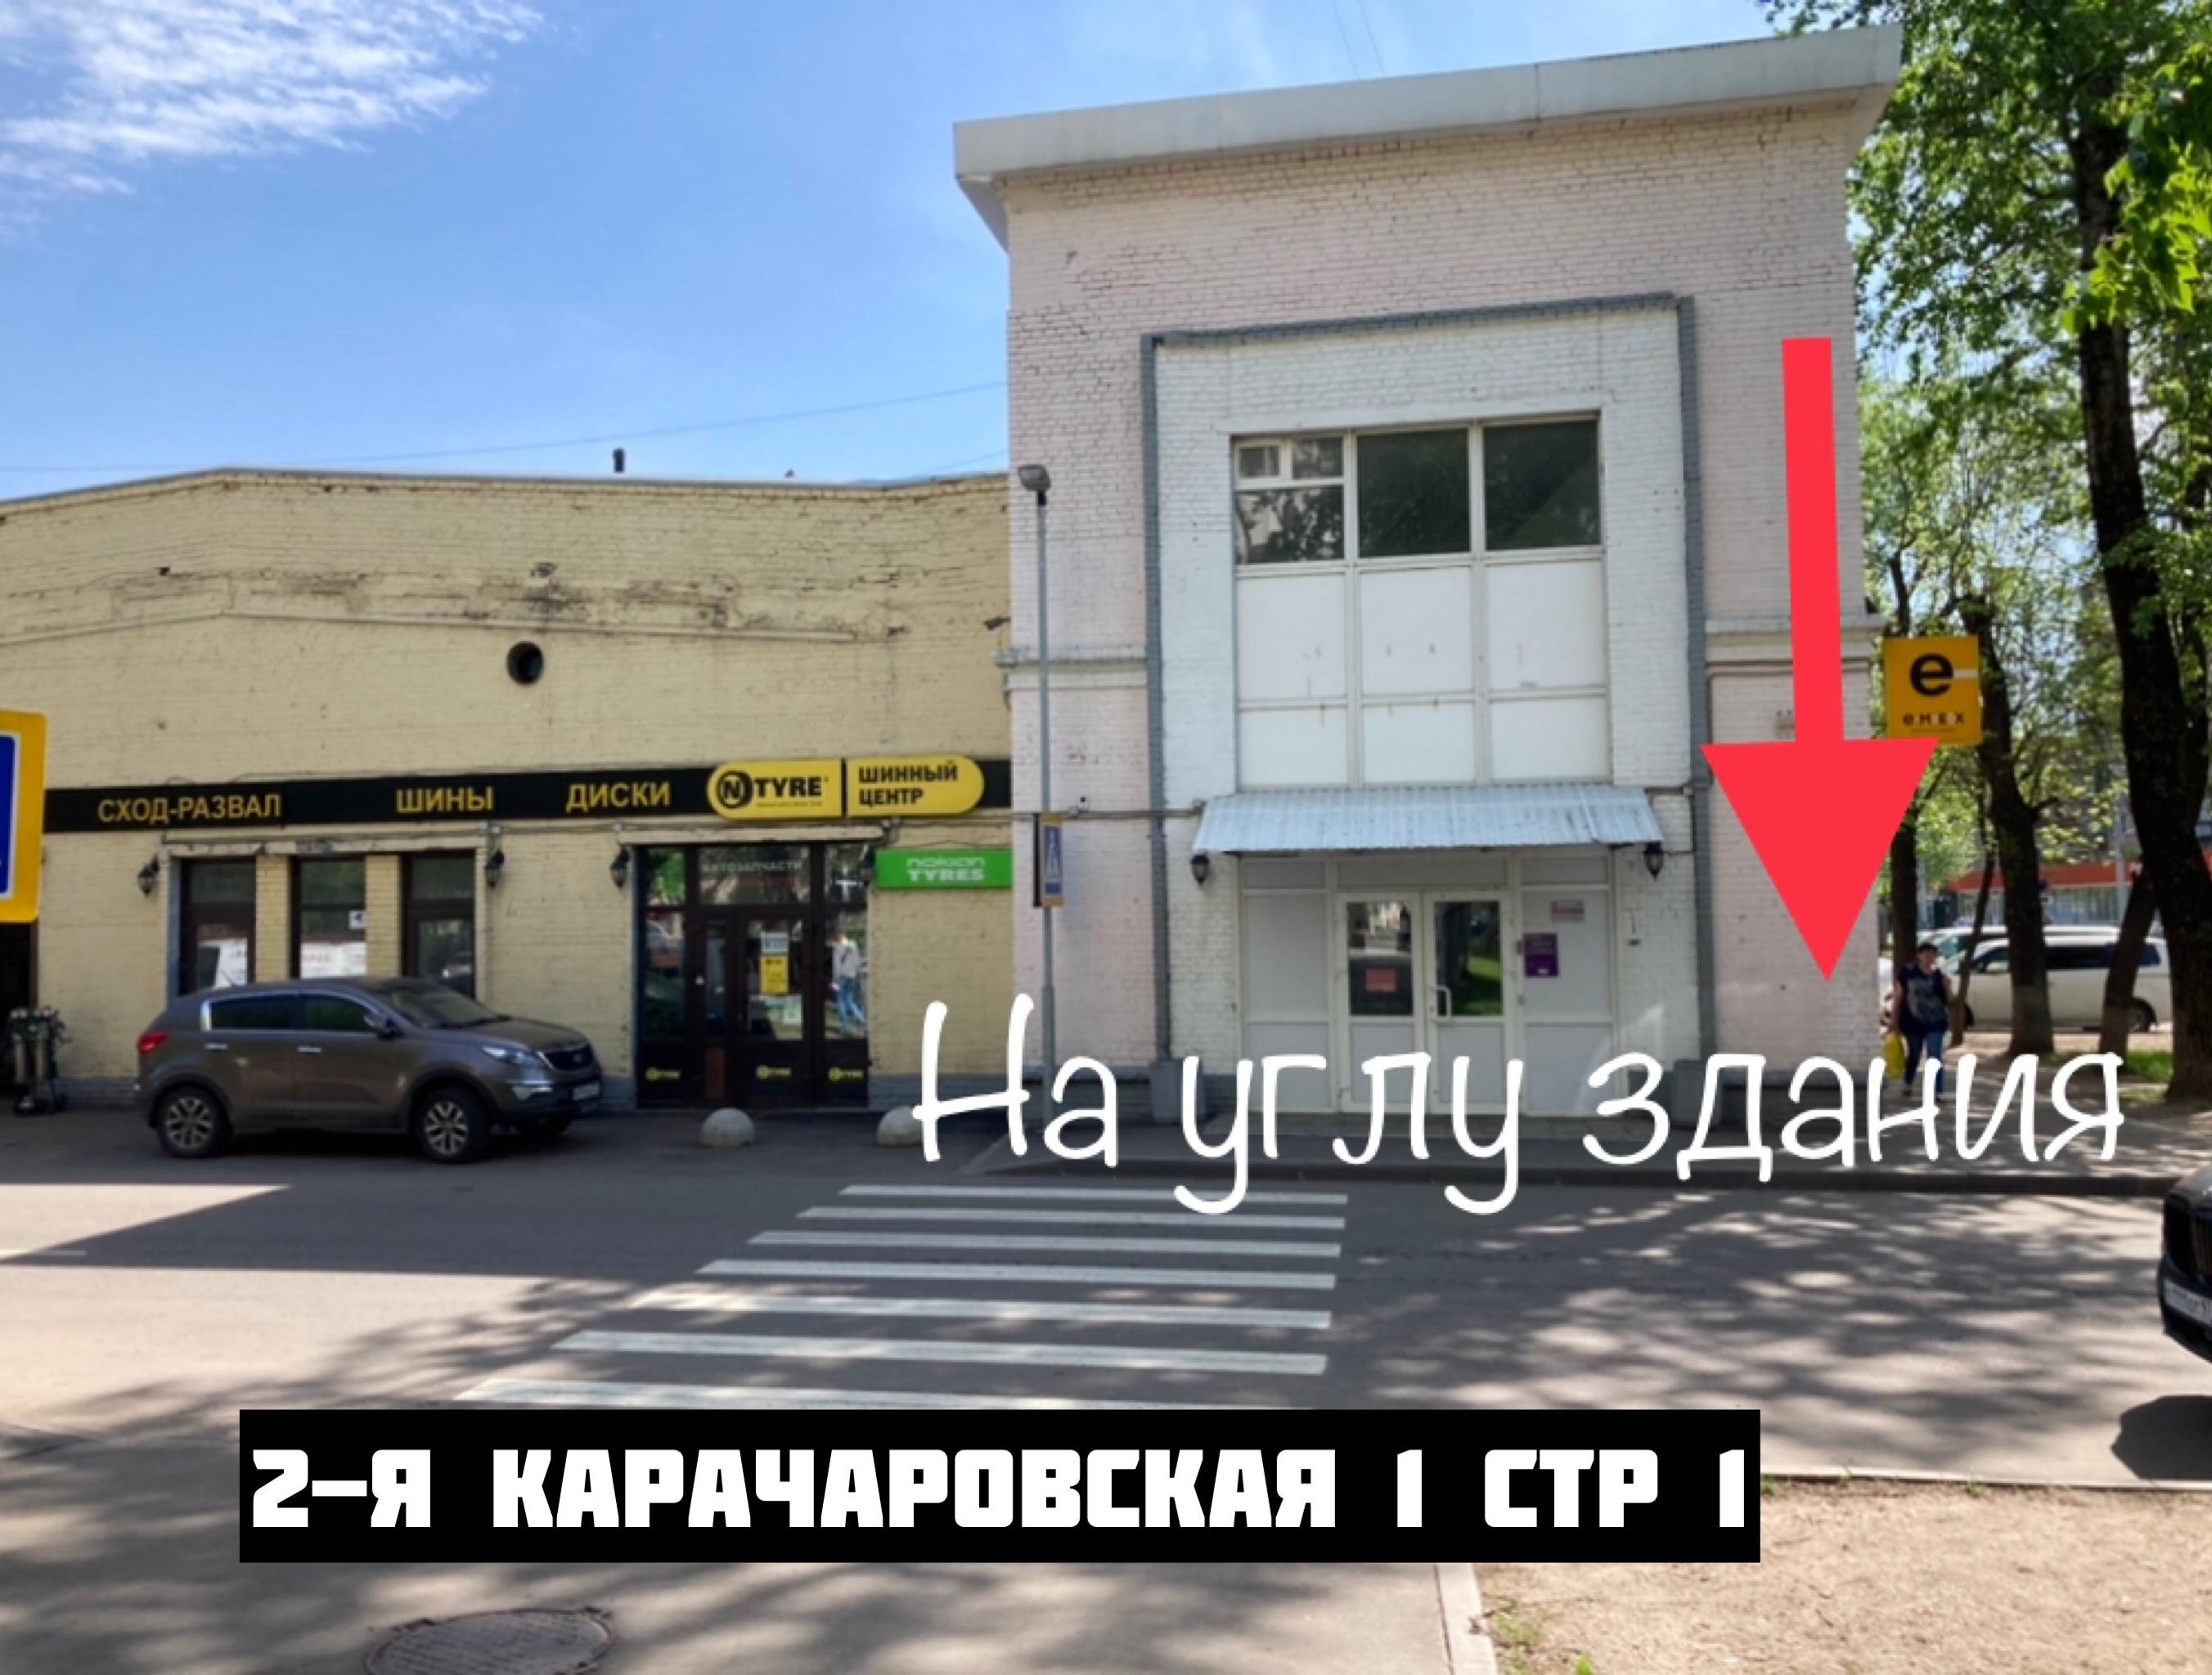 https://sticker-na-auto.ru/images/upload/photo-output.jpg